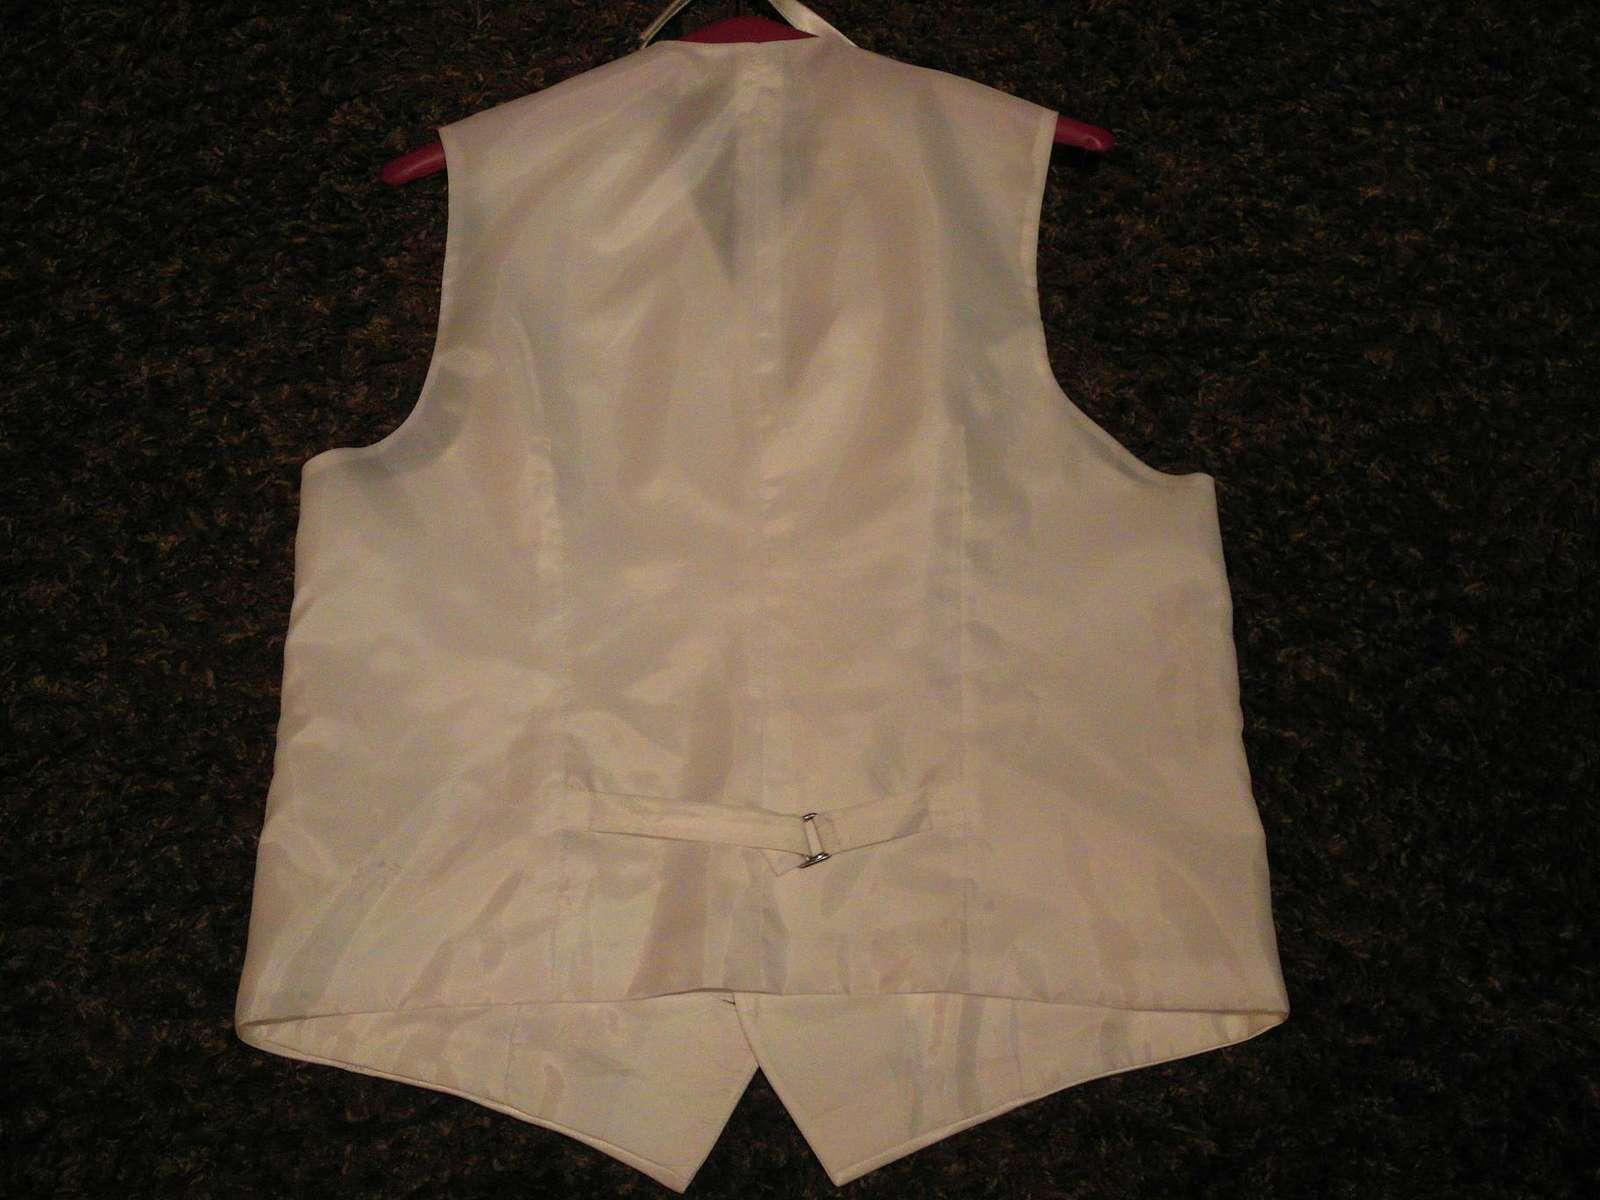 Biela leskla vesta s kravatou - Obrázok č. 4